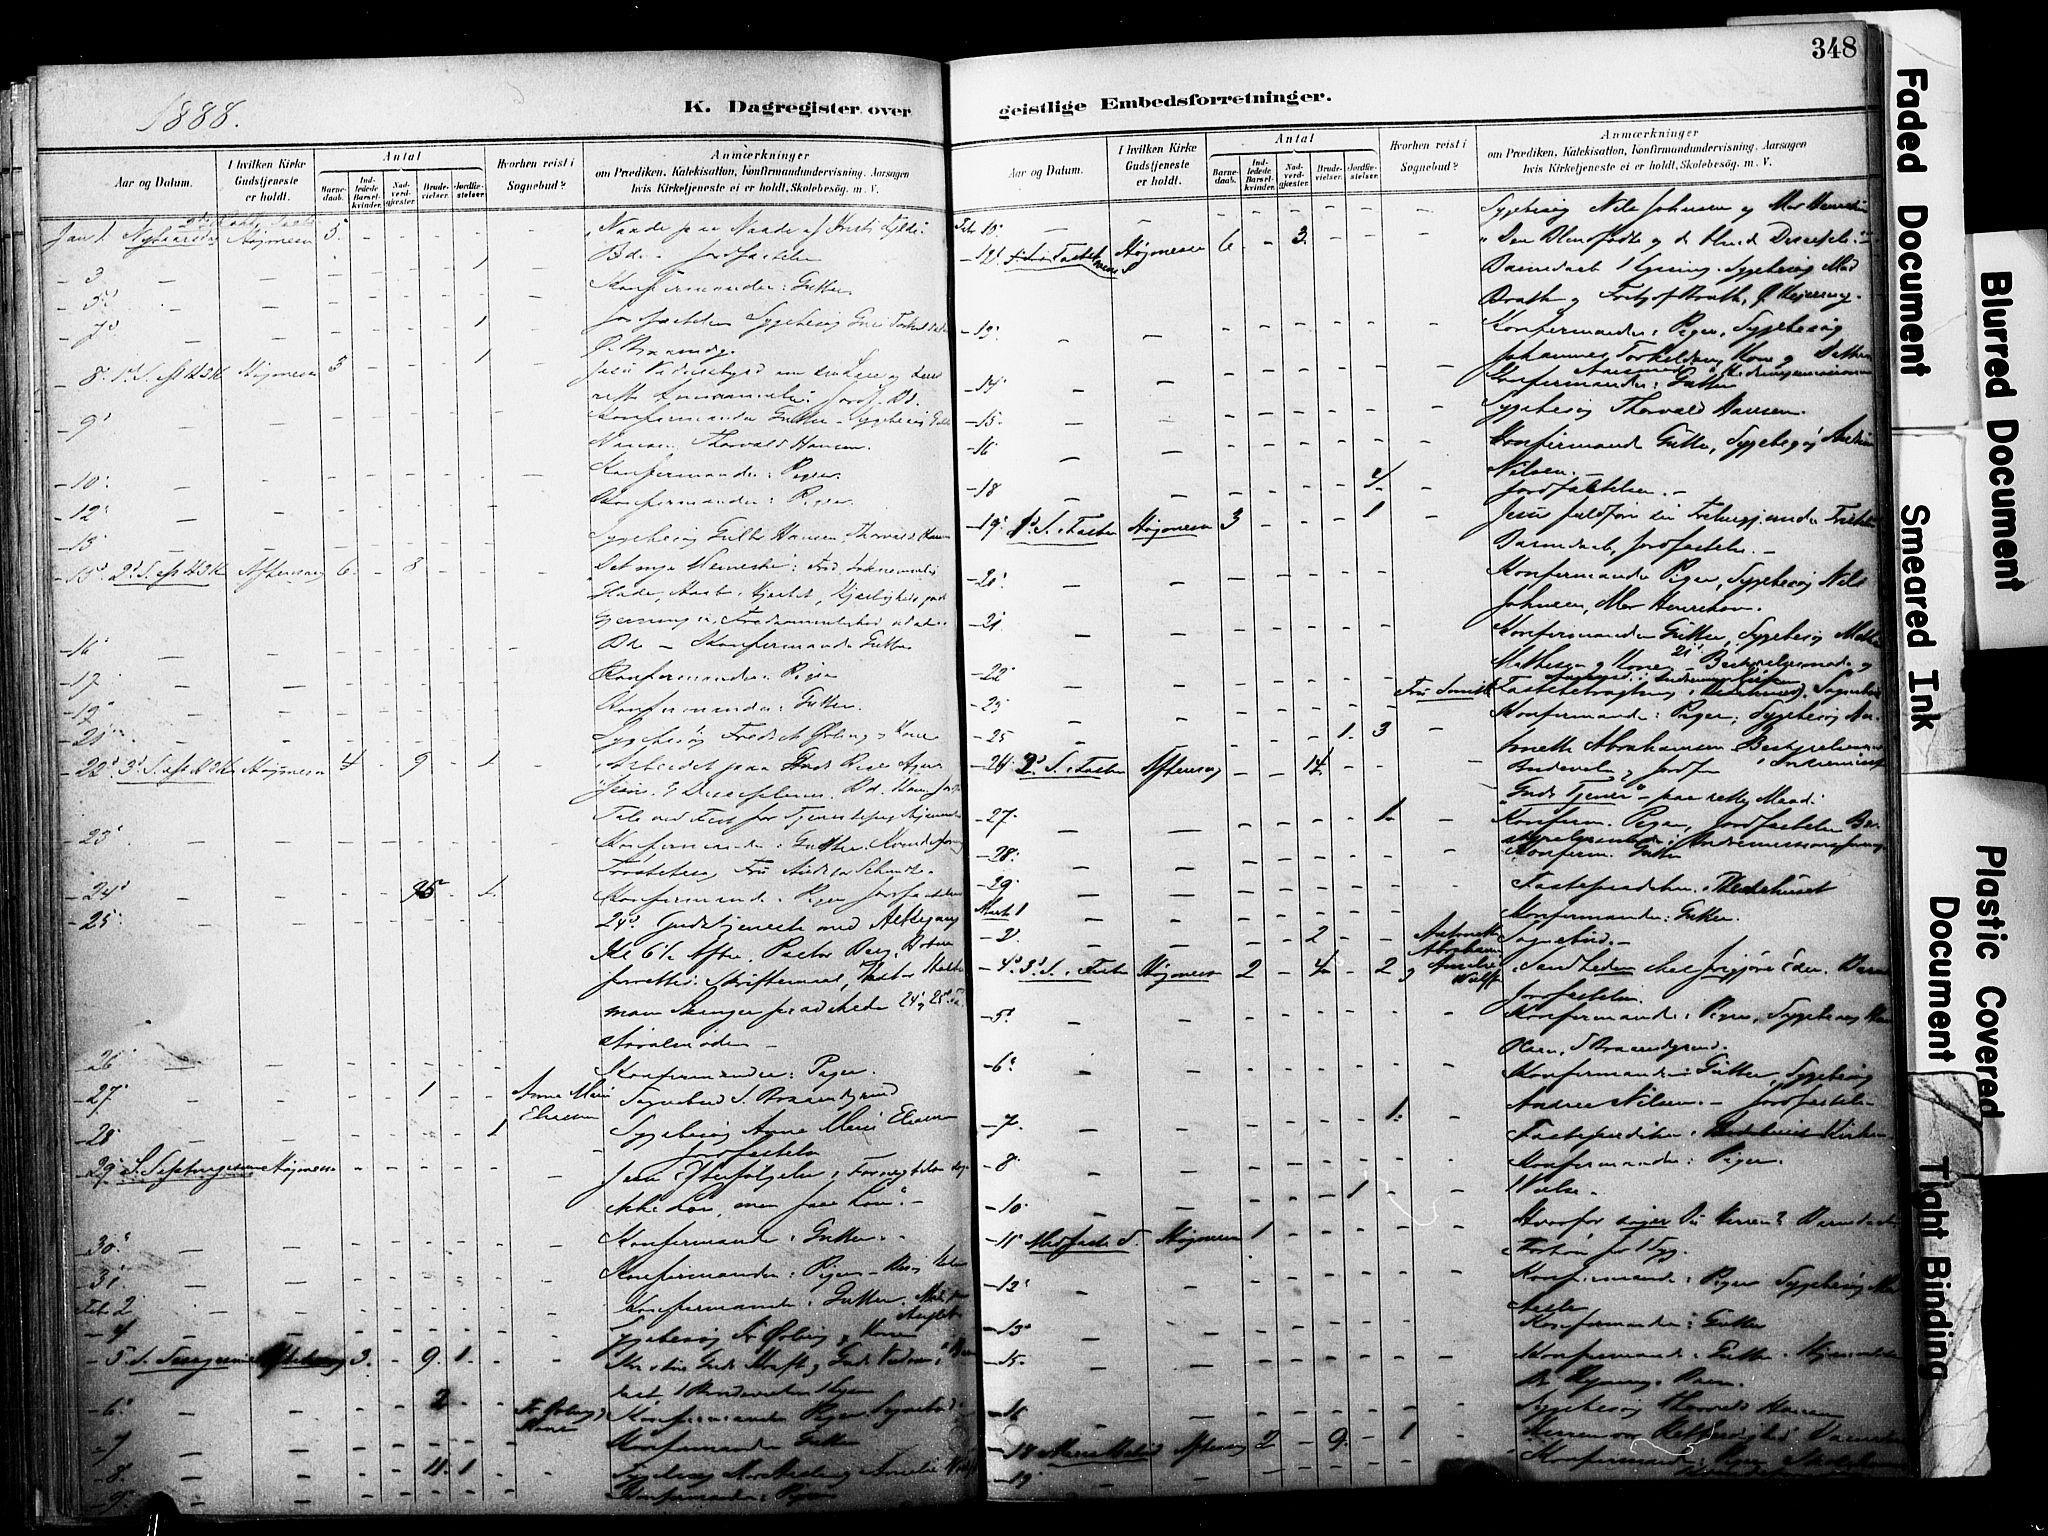 SAKO, Horten kirkebøker, F/Fa/L0004: Parish register (official) no. 4, 1888-1895, p. 348